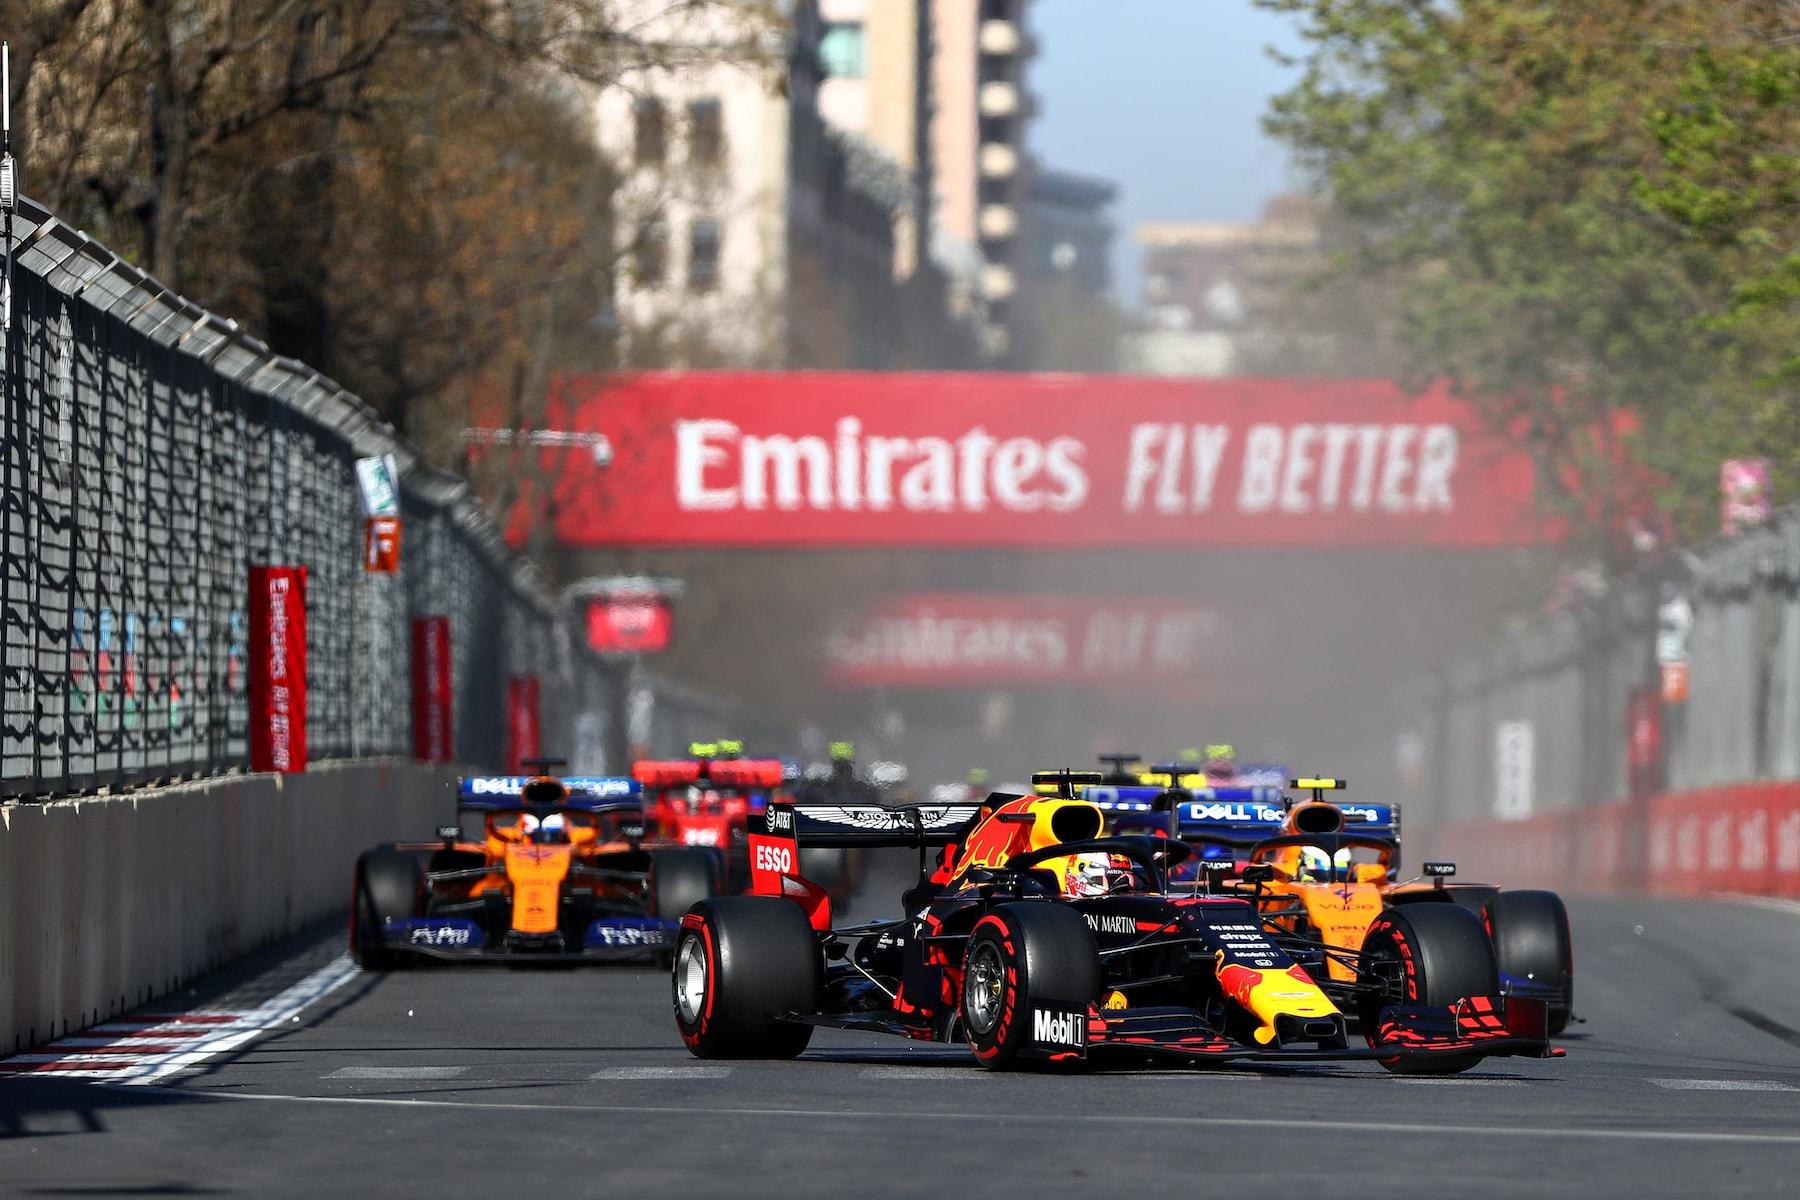 2019 Max Verstappen | Red Bull RB15 | 2019 Azerbaijan GP P4 2.jpg